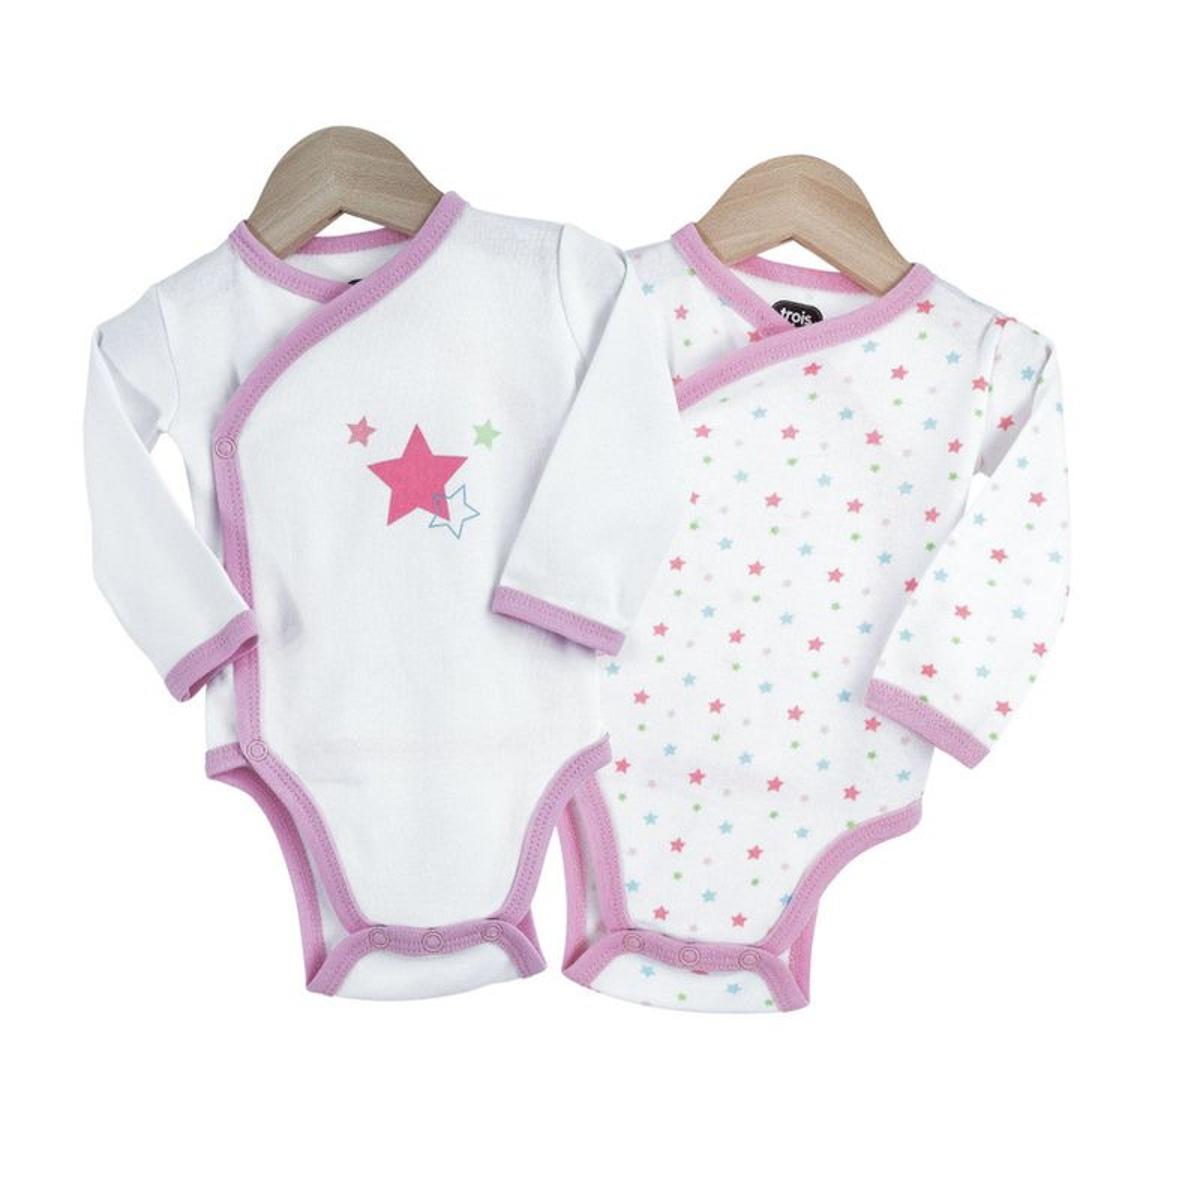 Body naissance fille - Little star x2